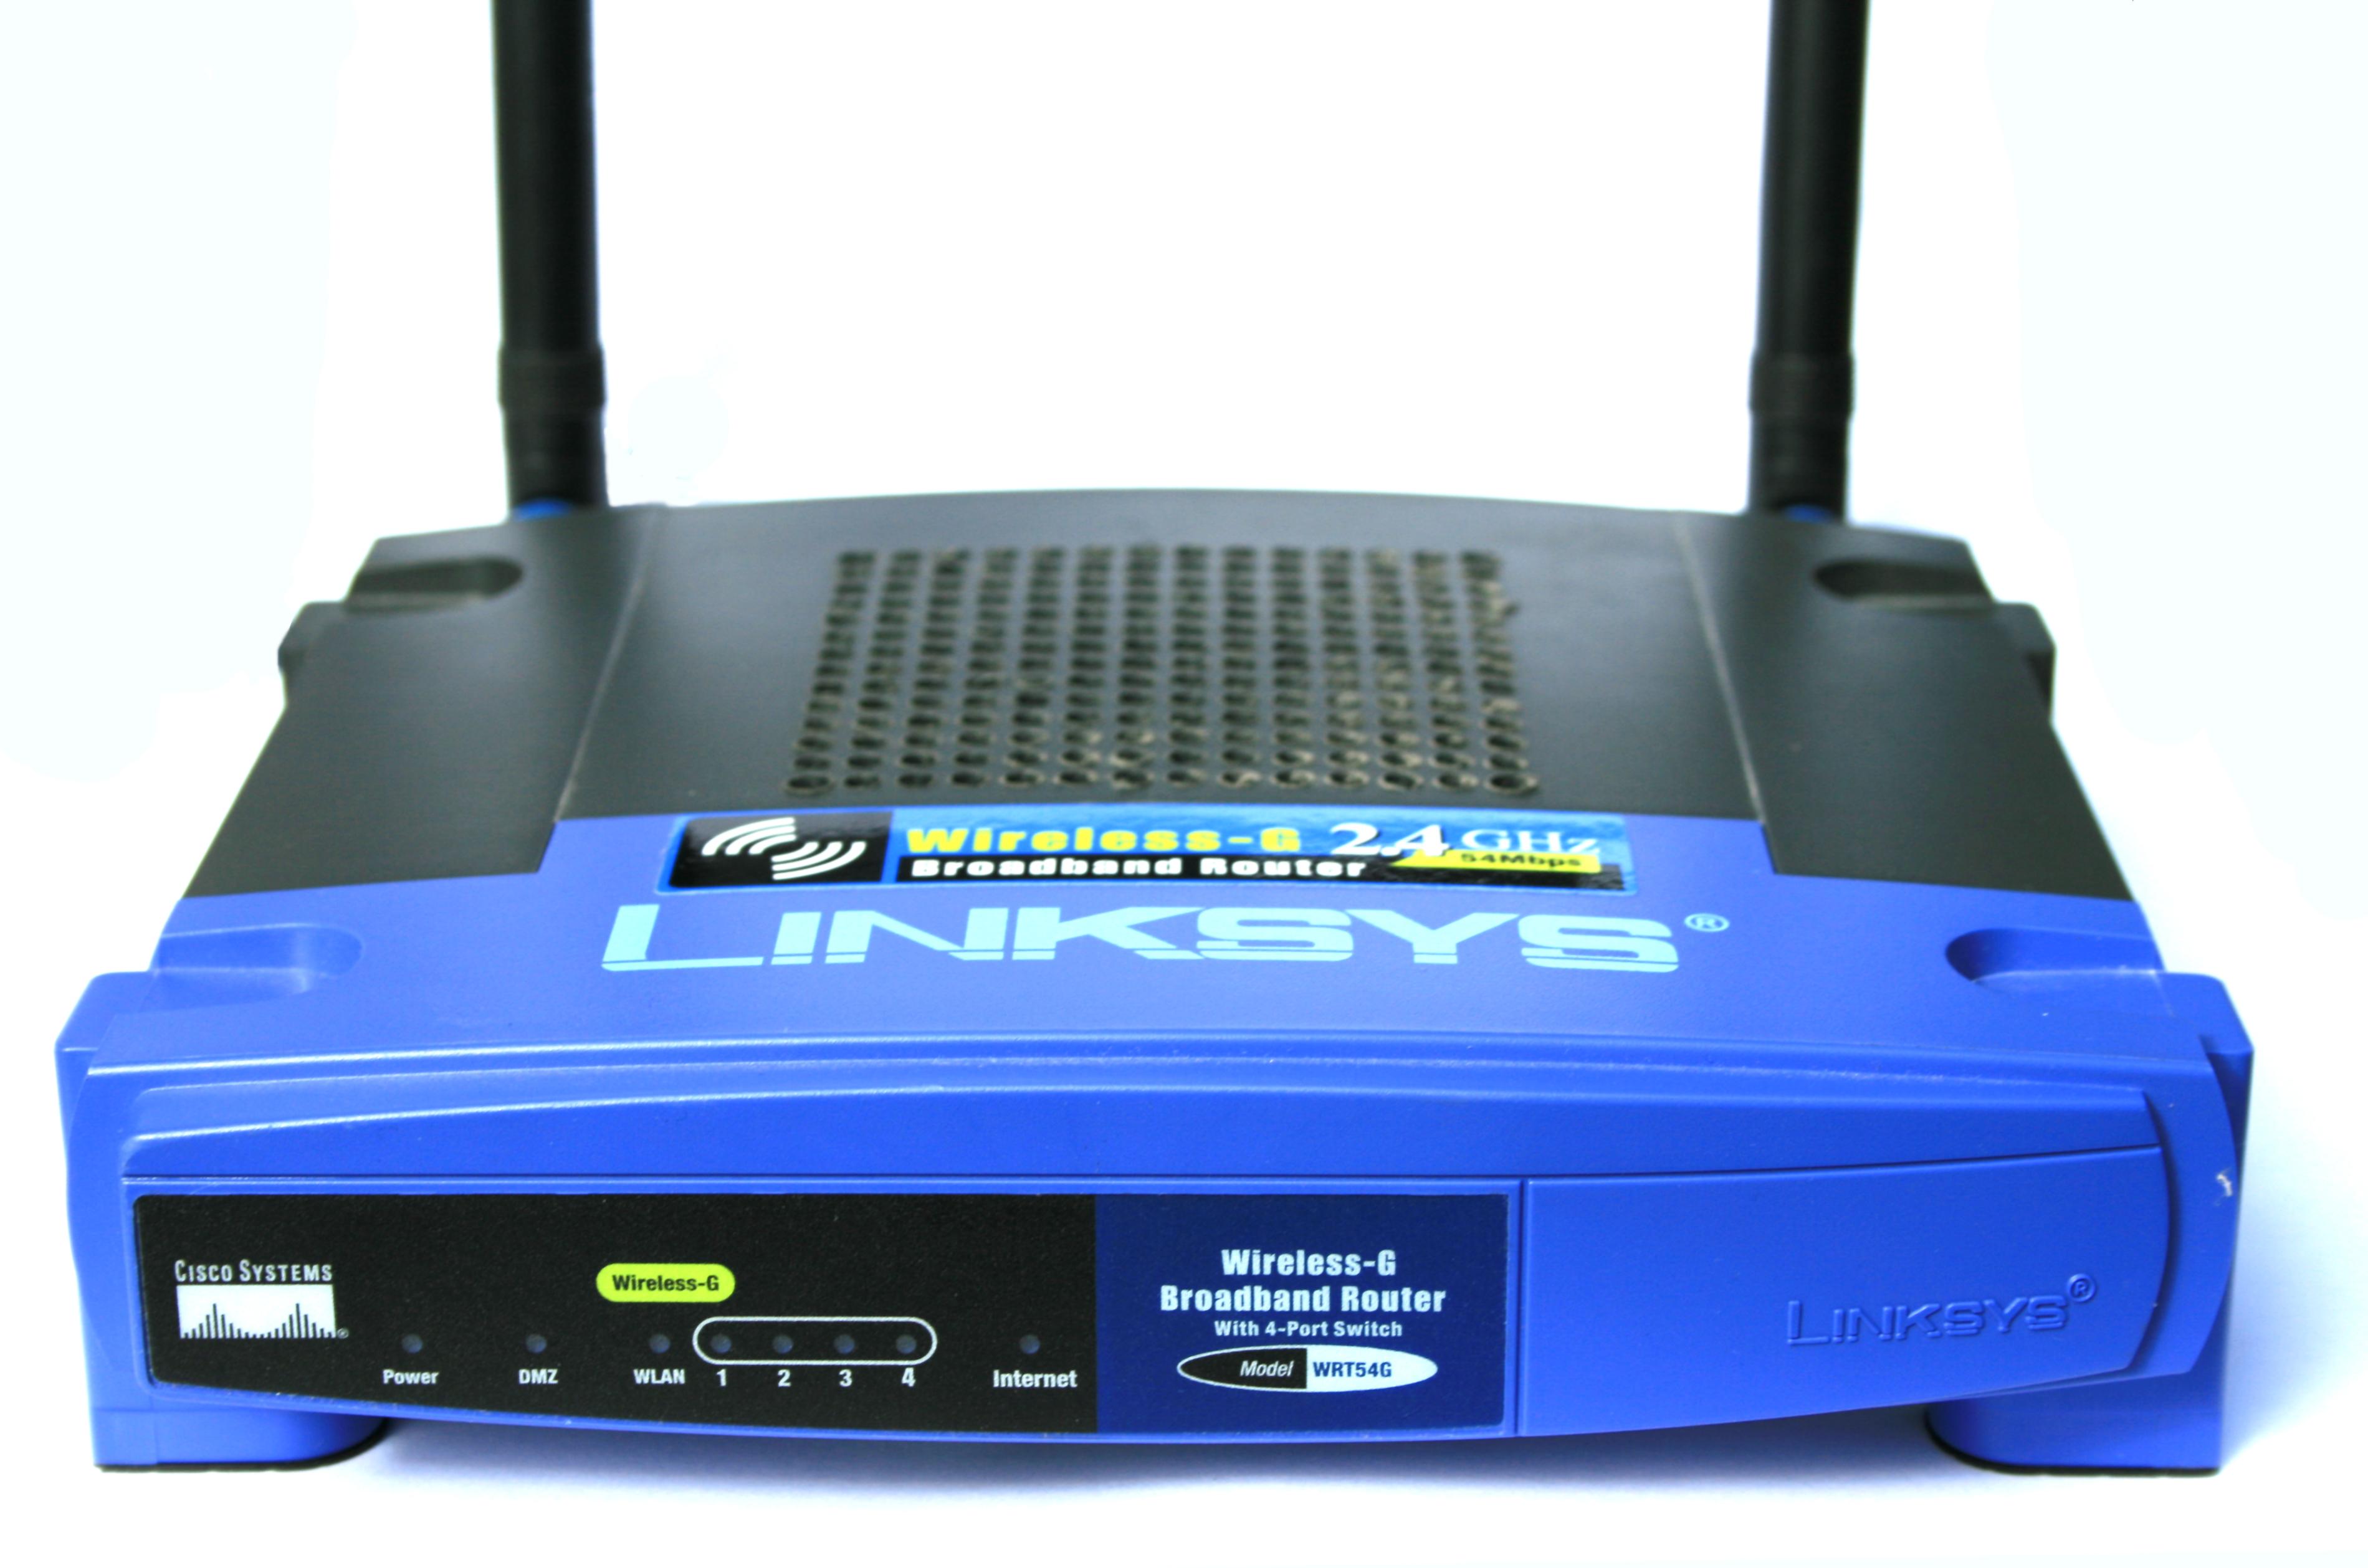 WRT54G_v2_Linksys_Router_Digon3[1]